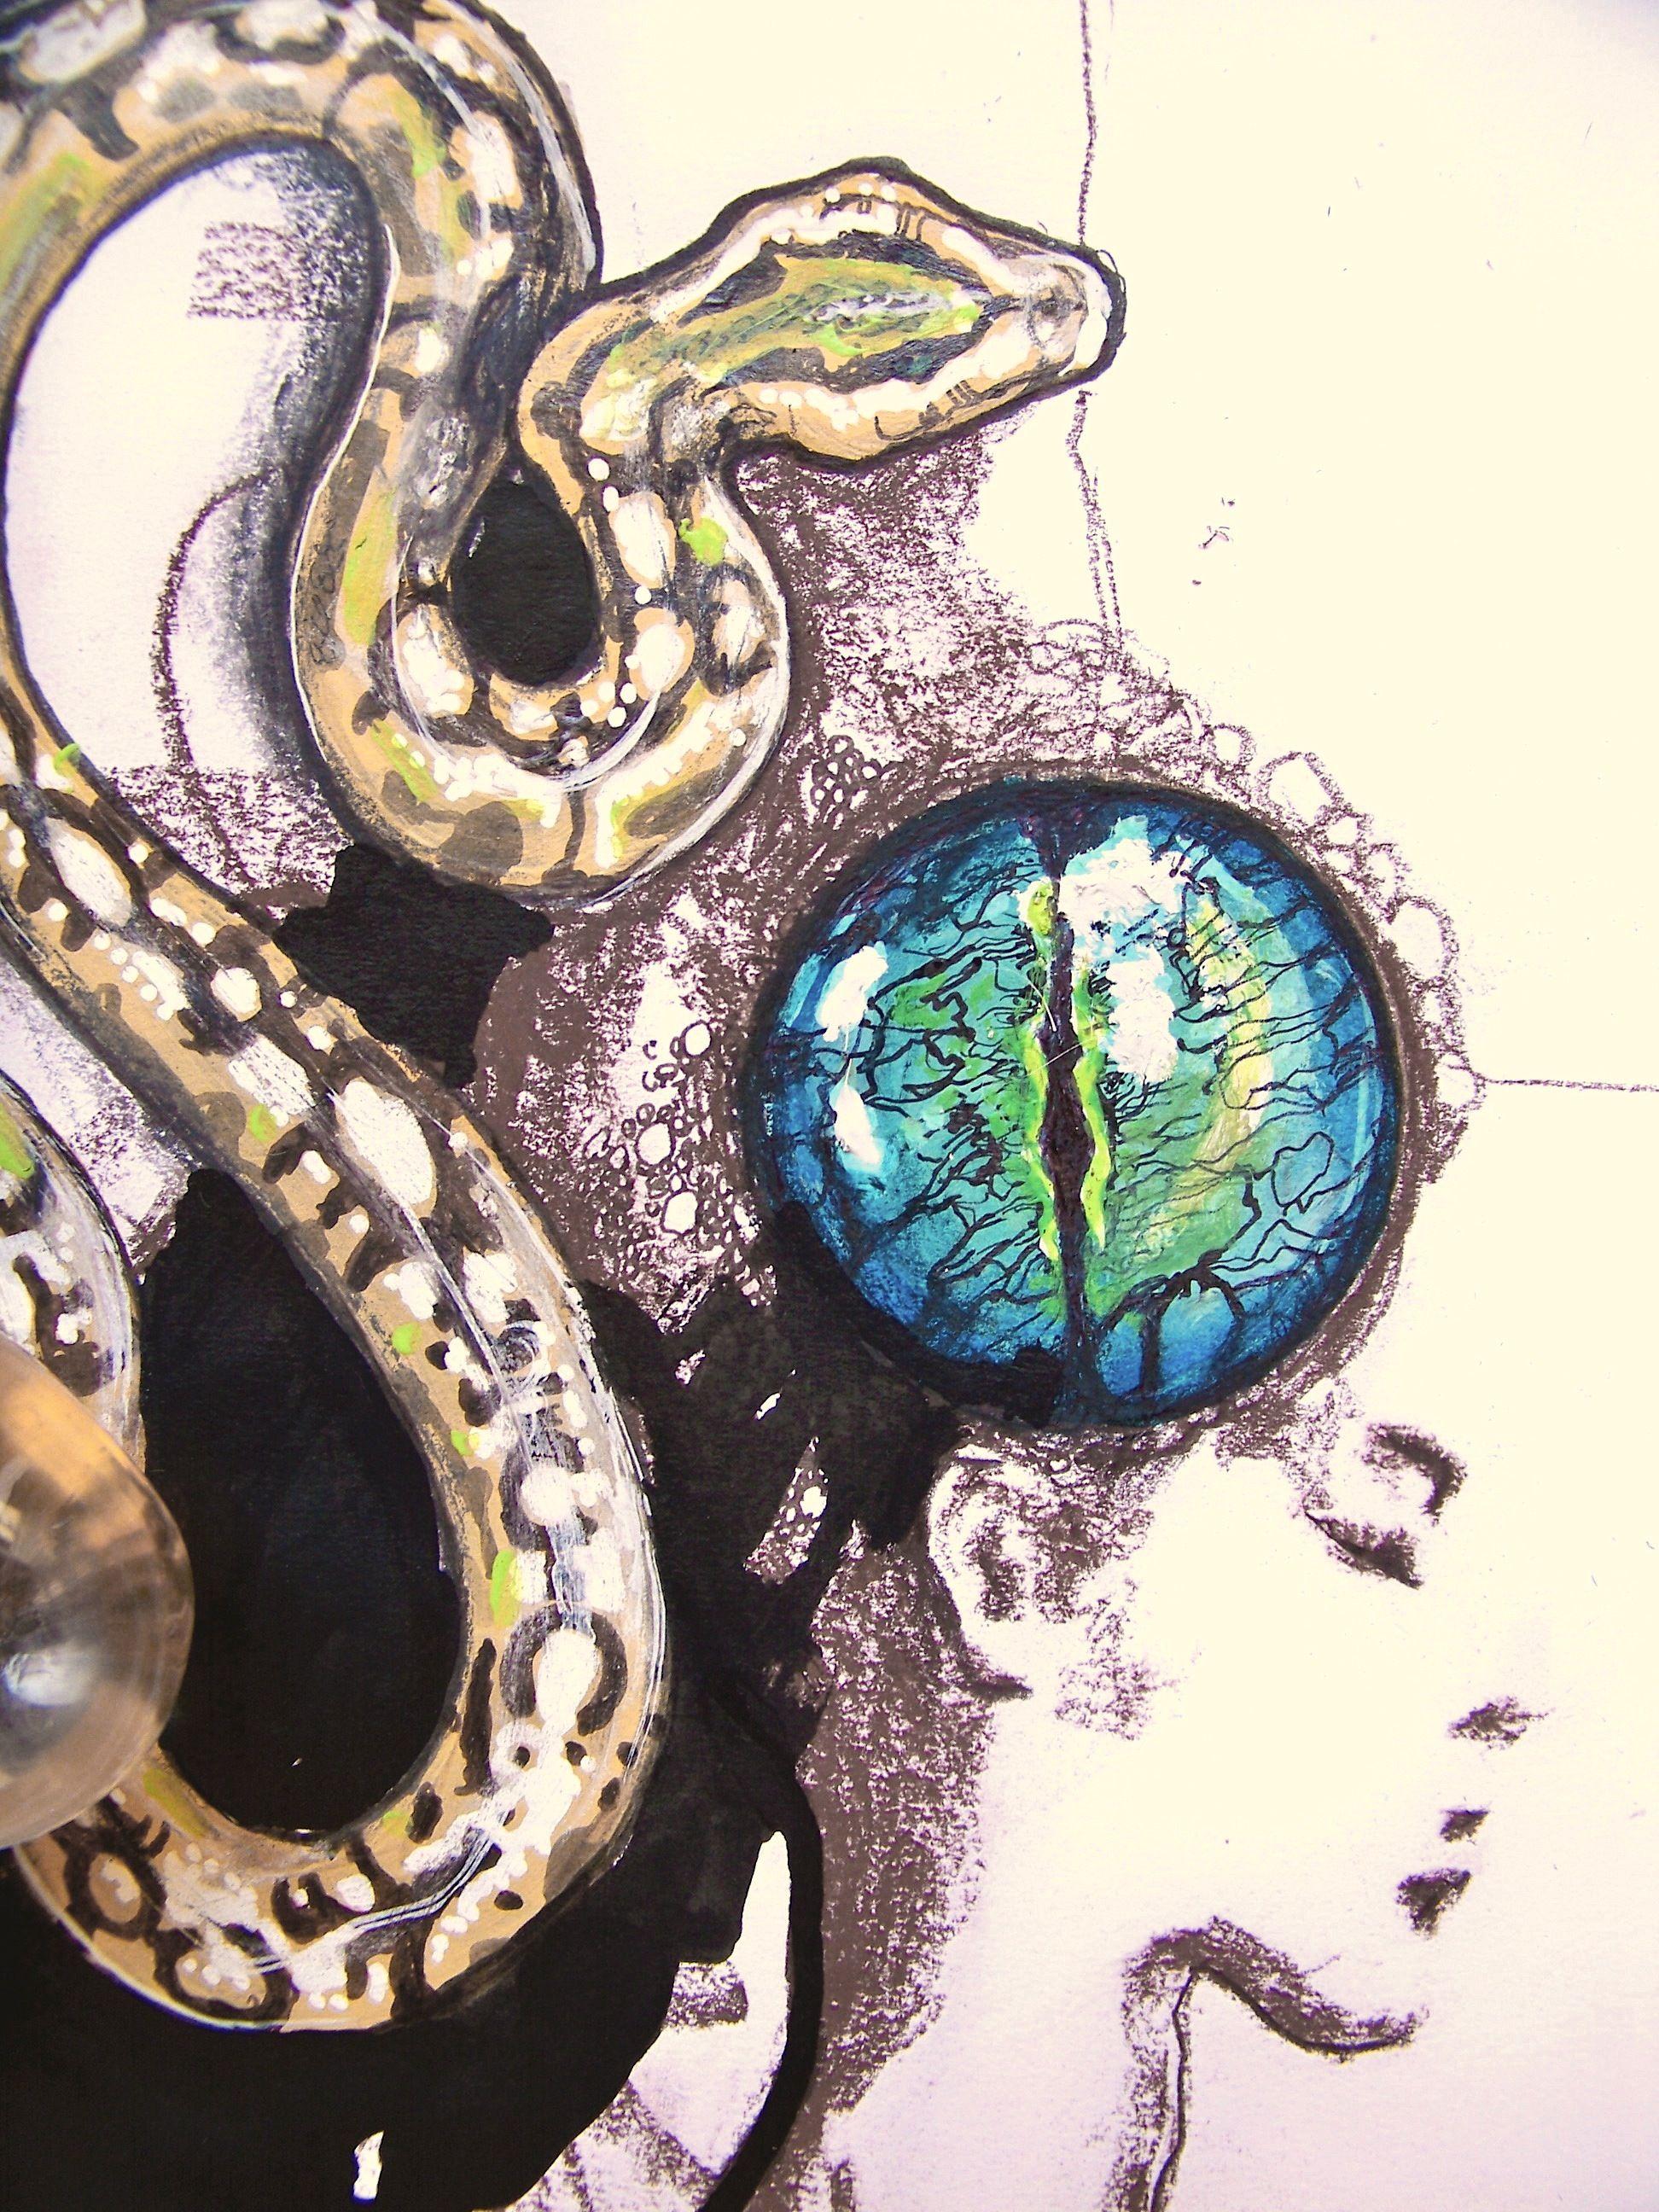 Illustration marie roura epureatelier marieroura illustration marie roura epureatelier marieroura epureatelier eye kundalini snakes buycottarizona